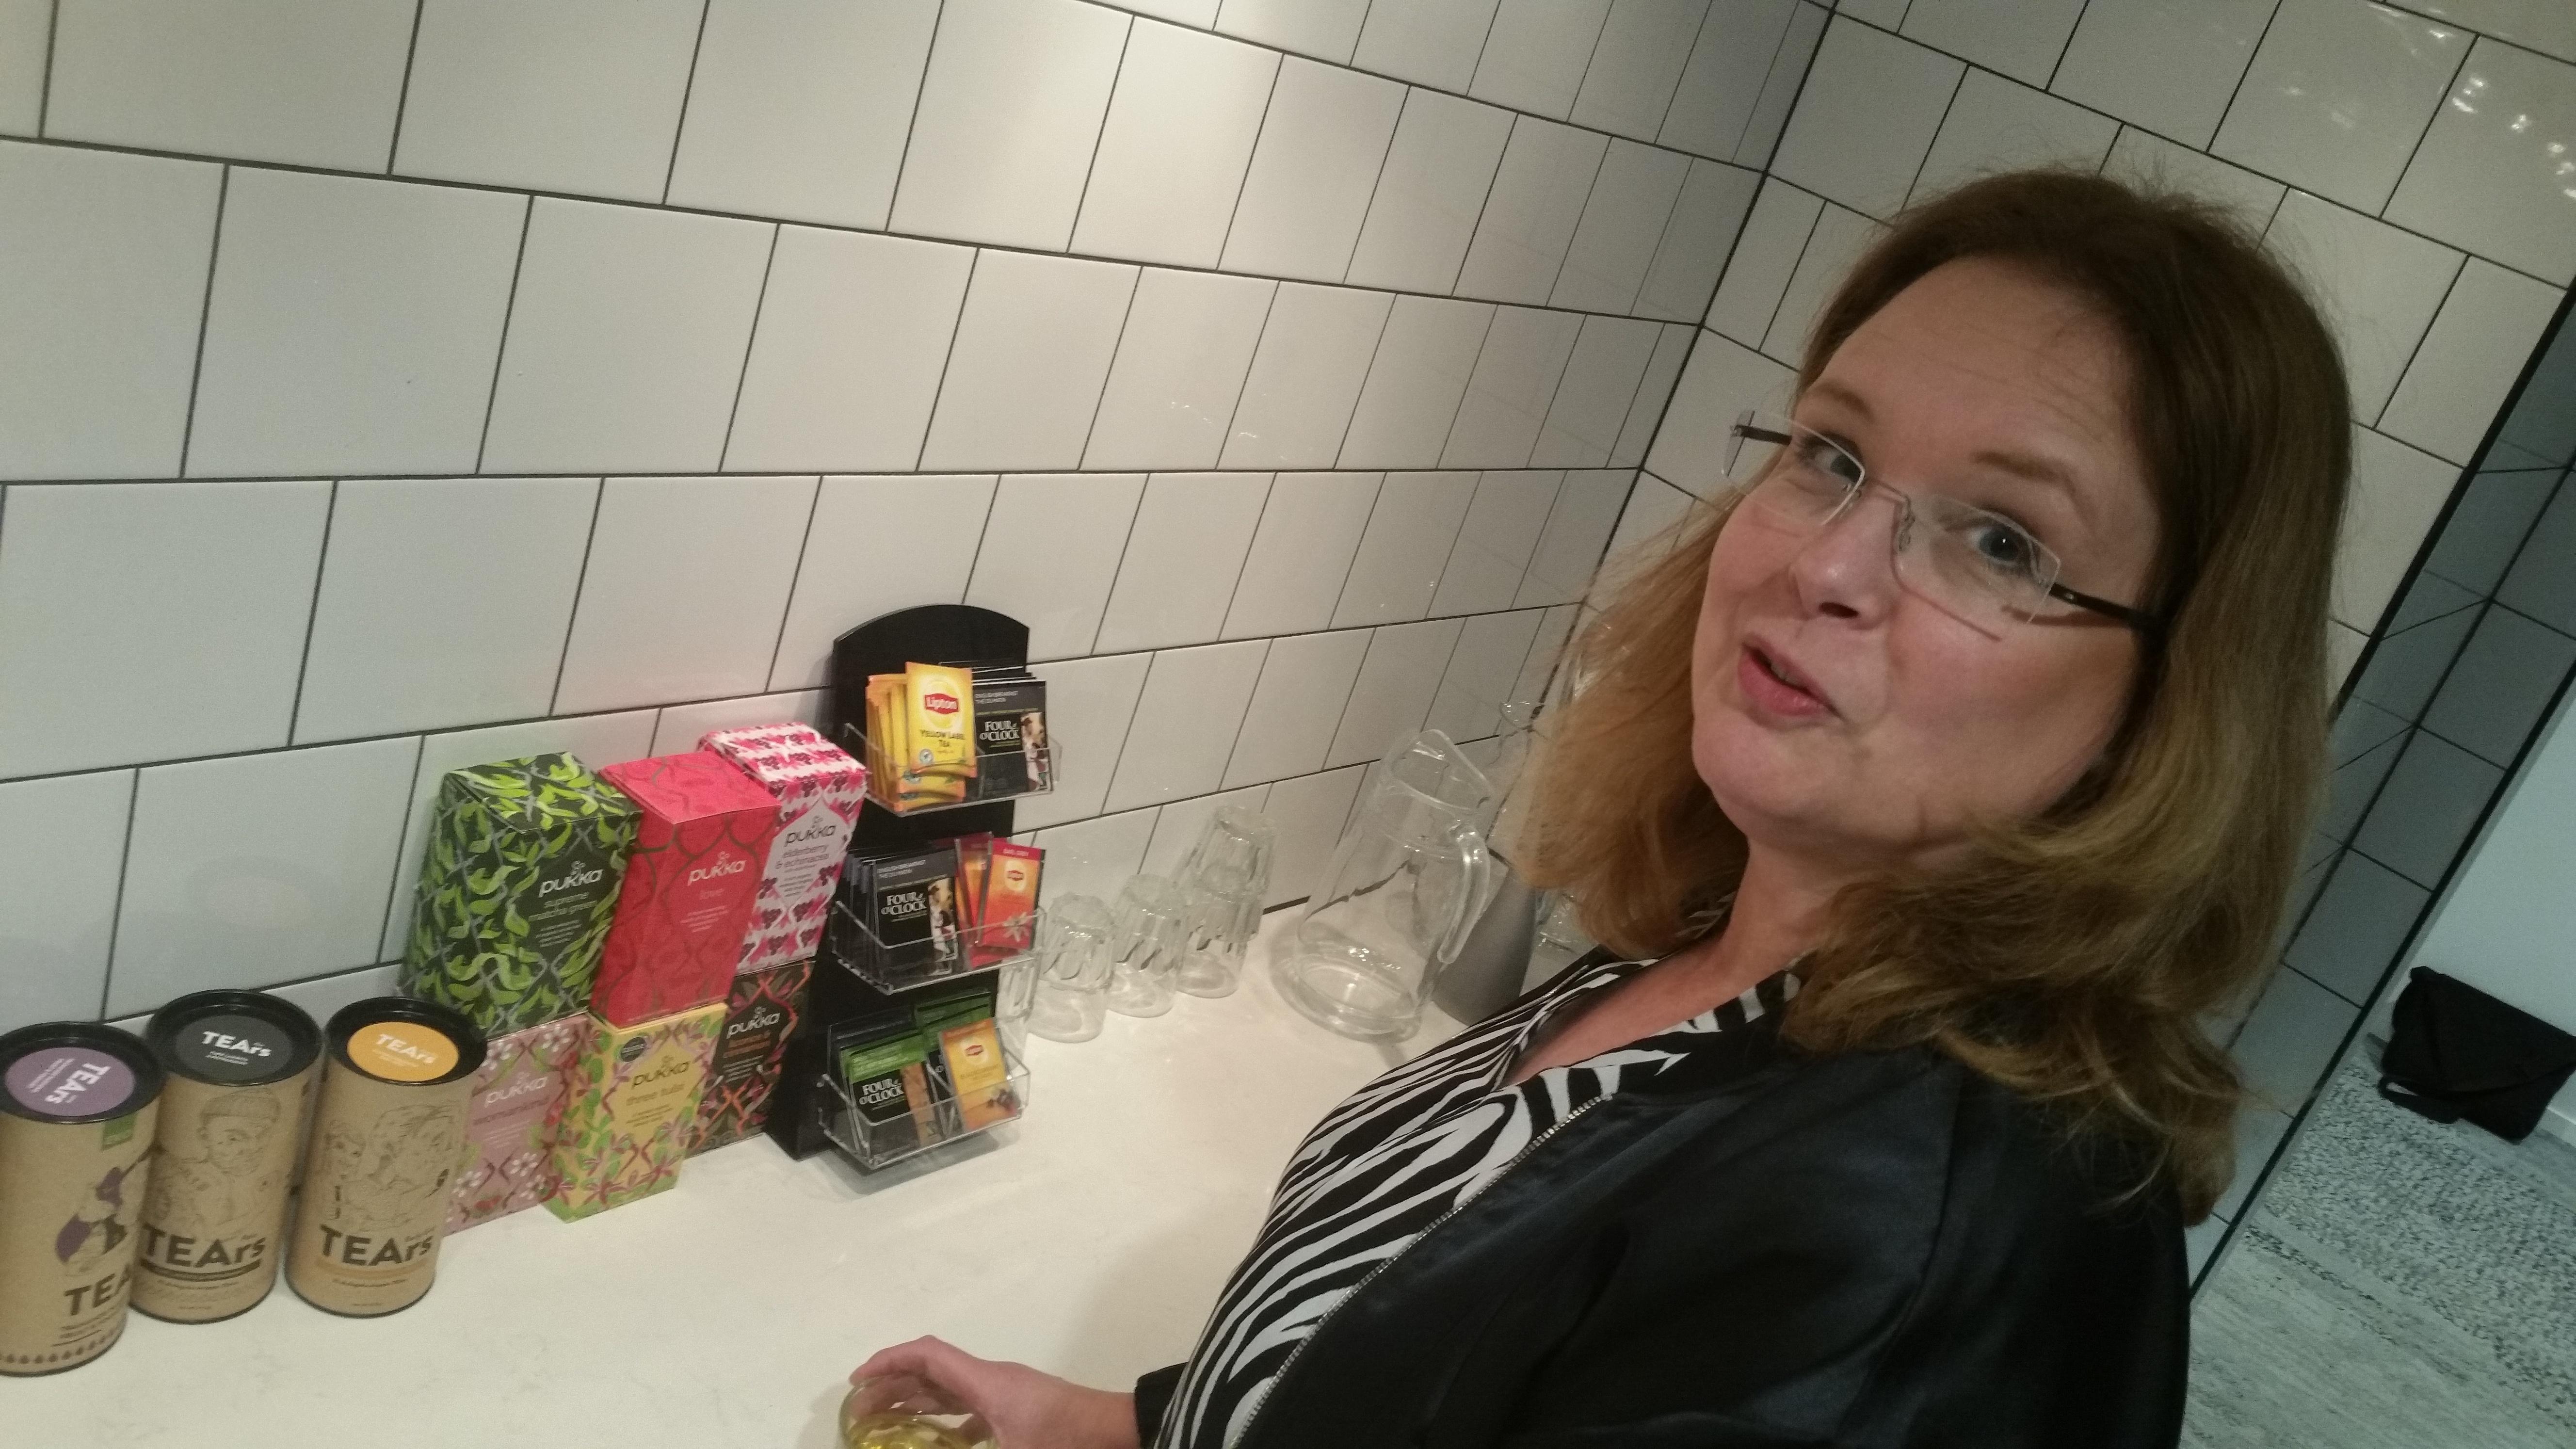 Nanette Segerlund